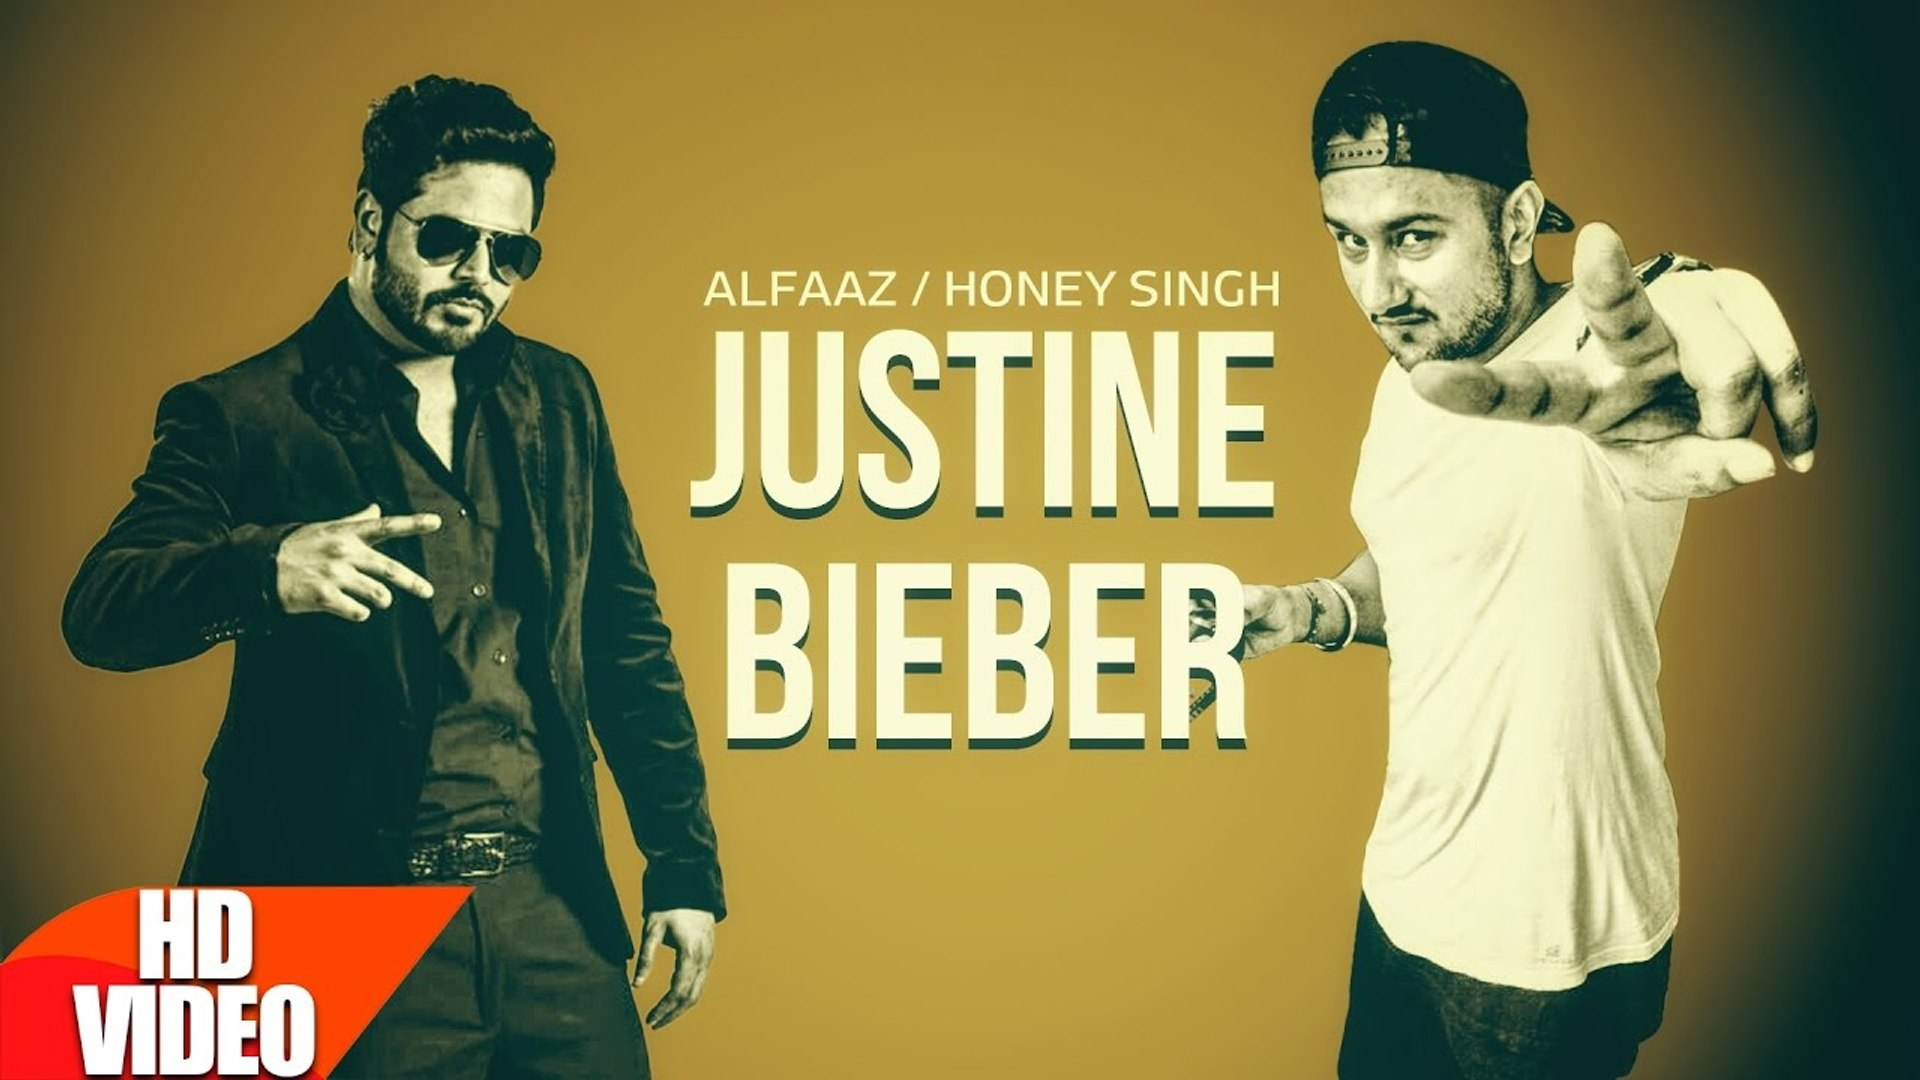 Justin Bieber HD Video Song Alfaaz Feat Honey Singh 2017 New Songs